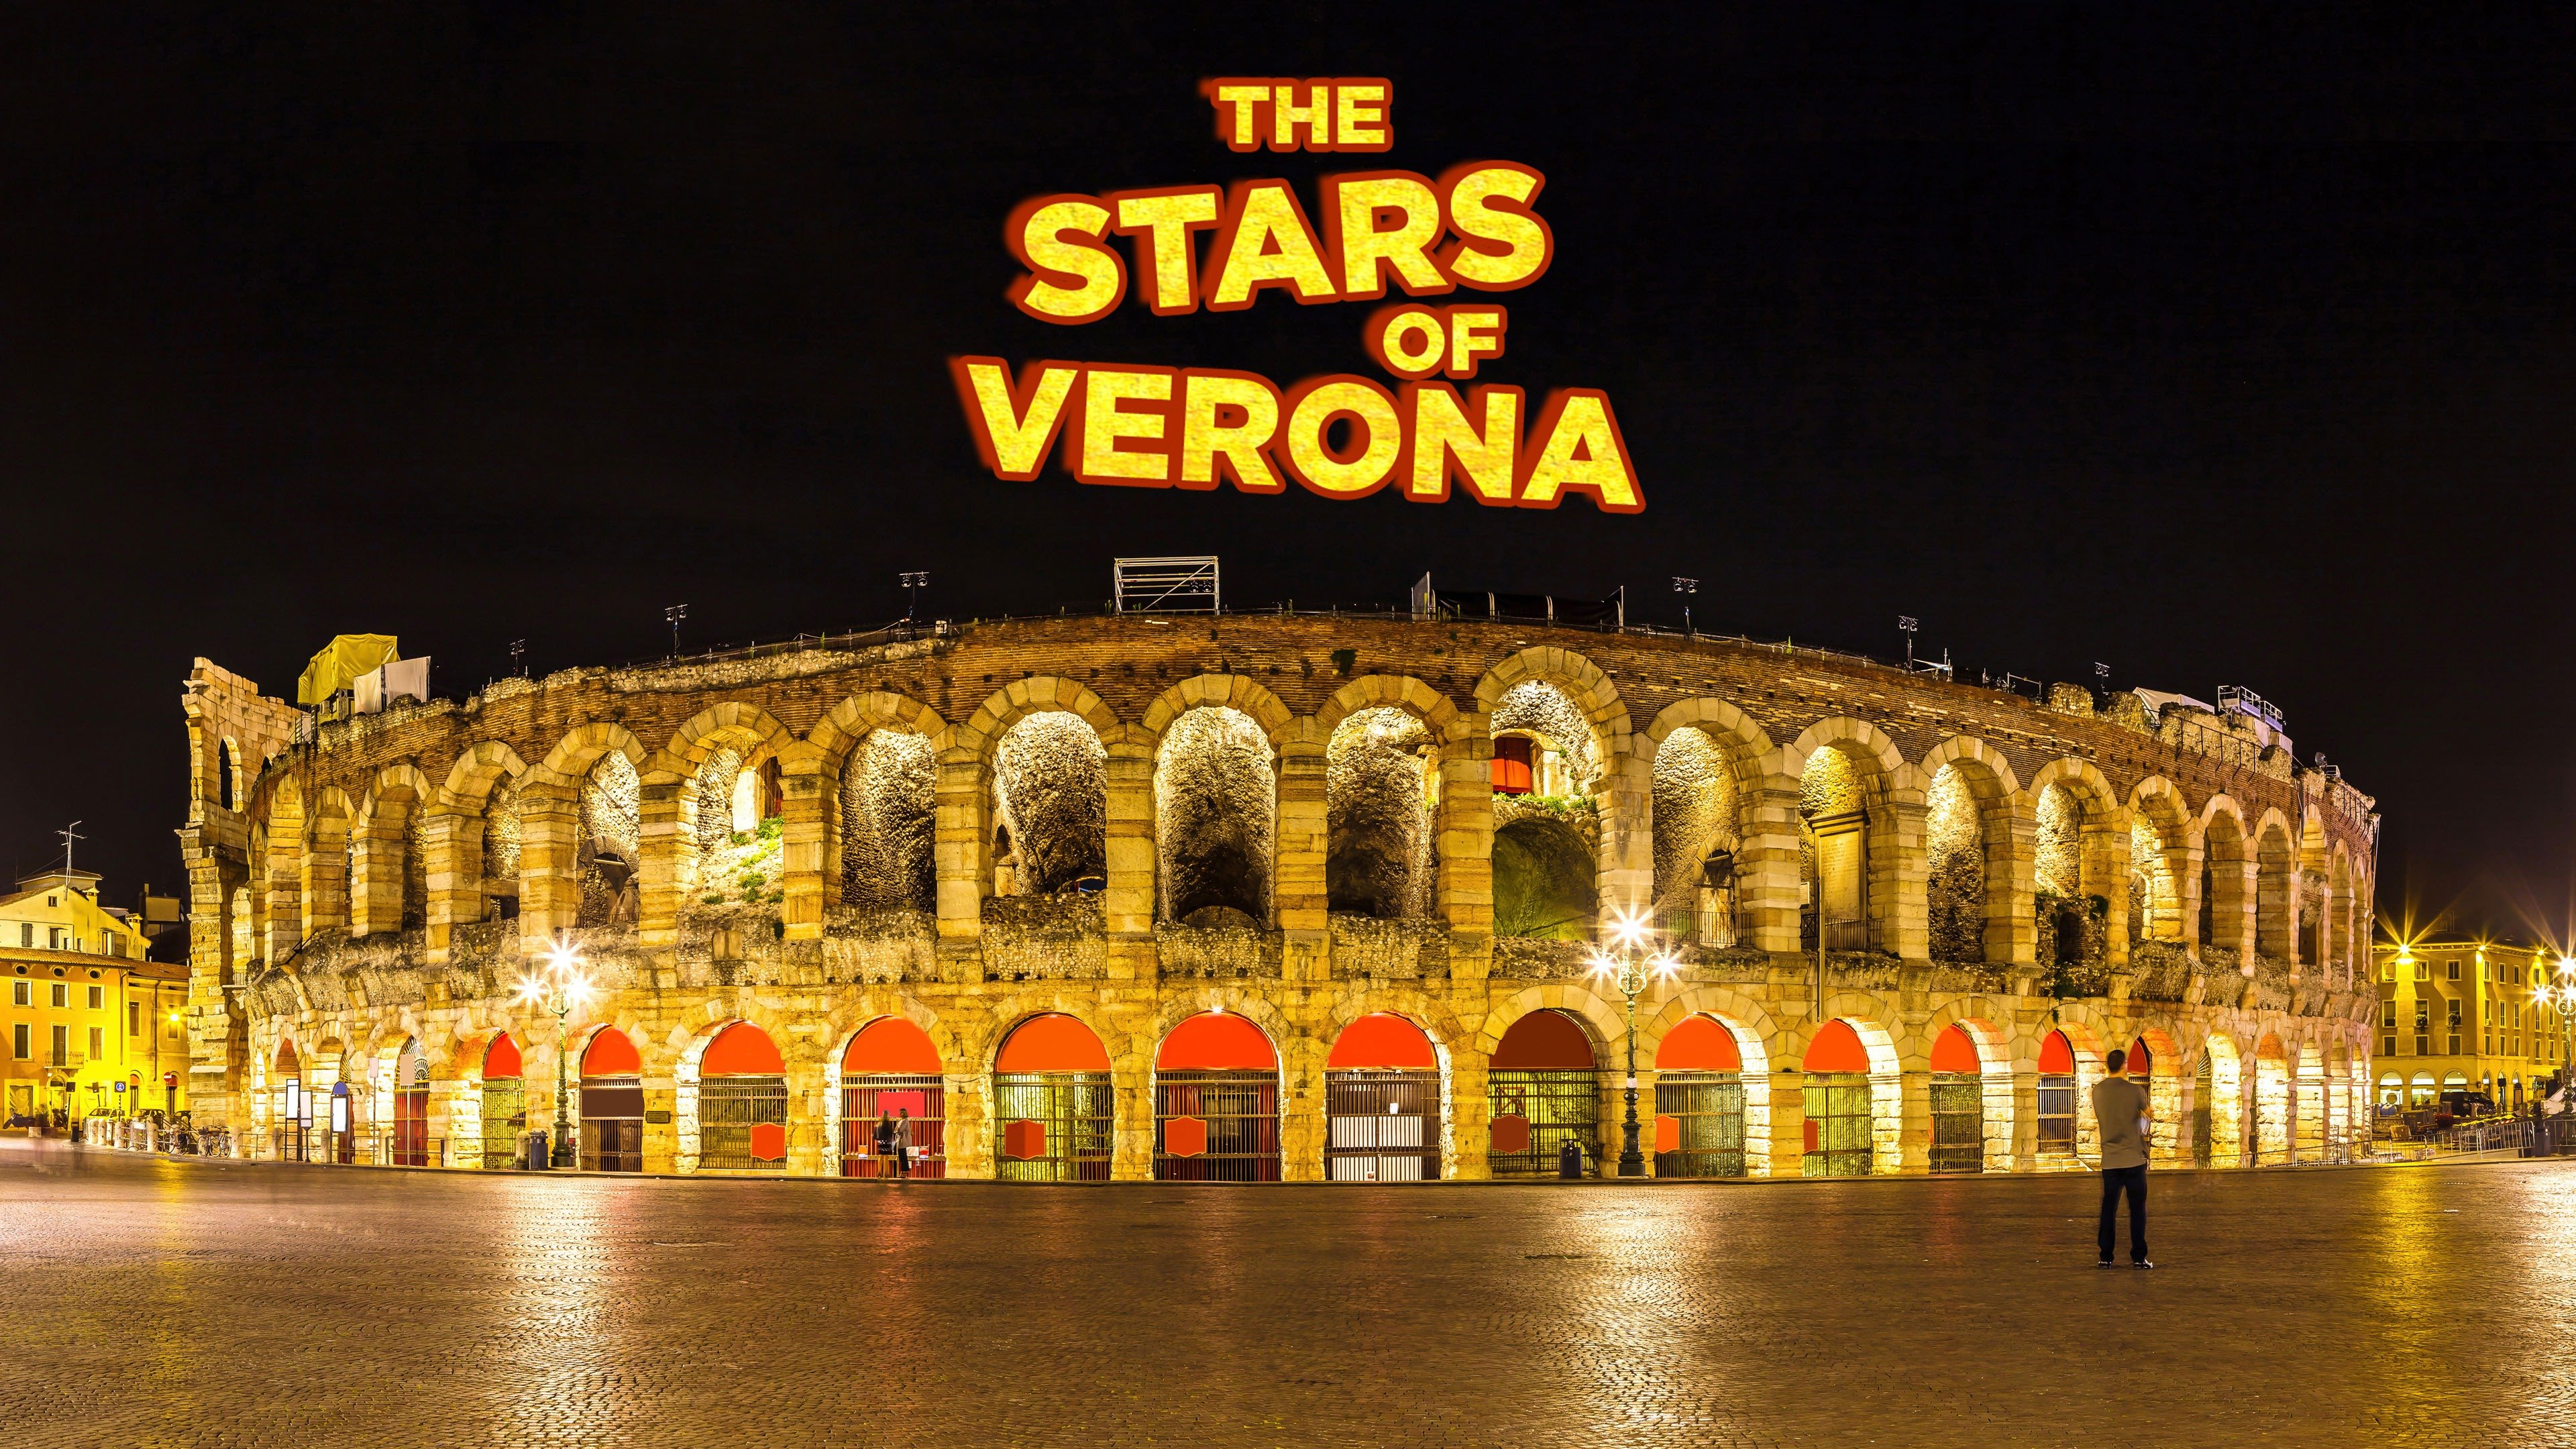 The Stars of Verona